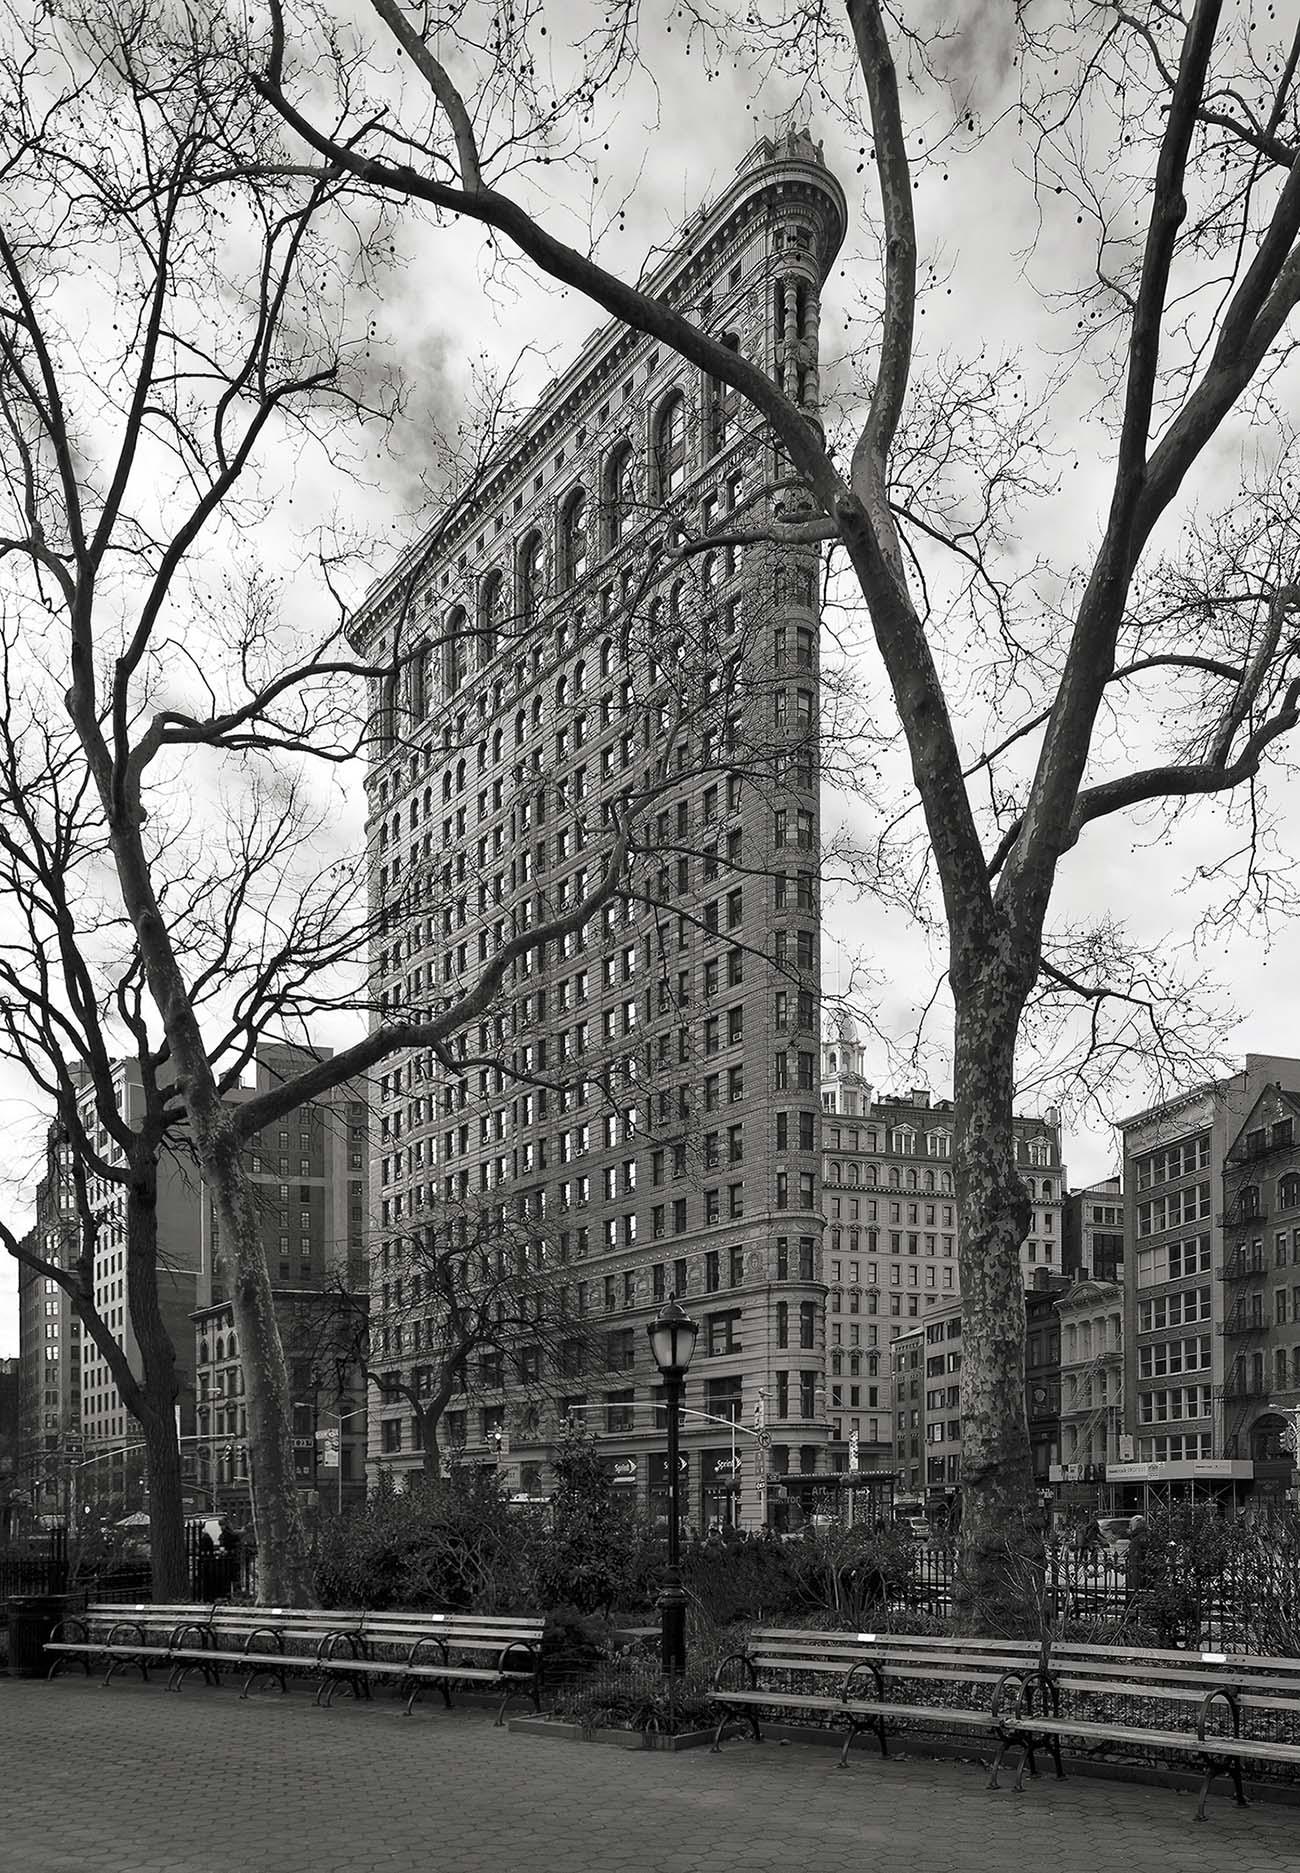 Flatiron (New York City), Dieter Hessel